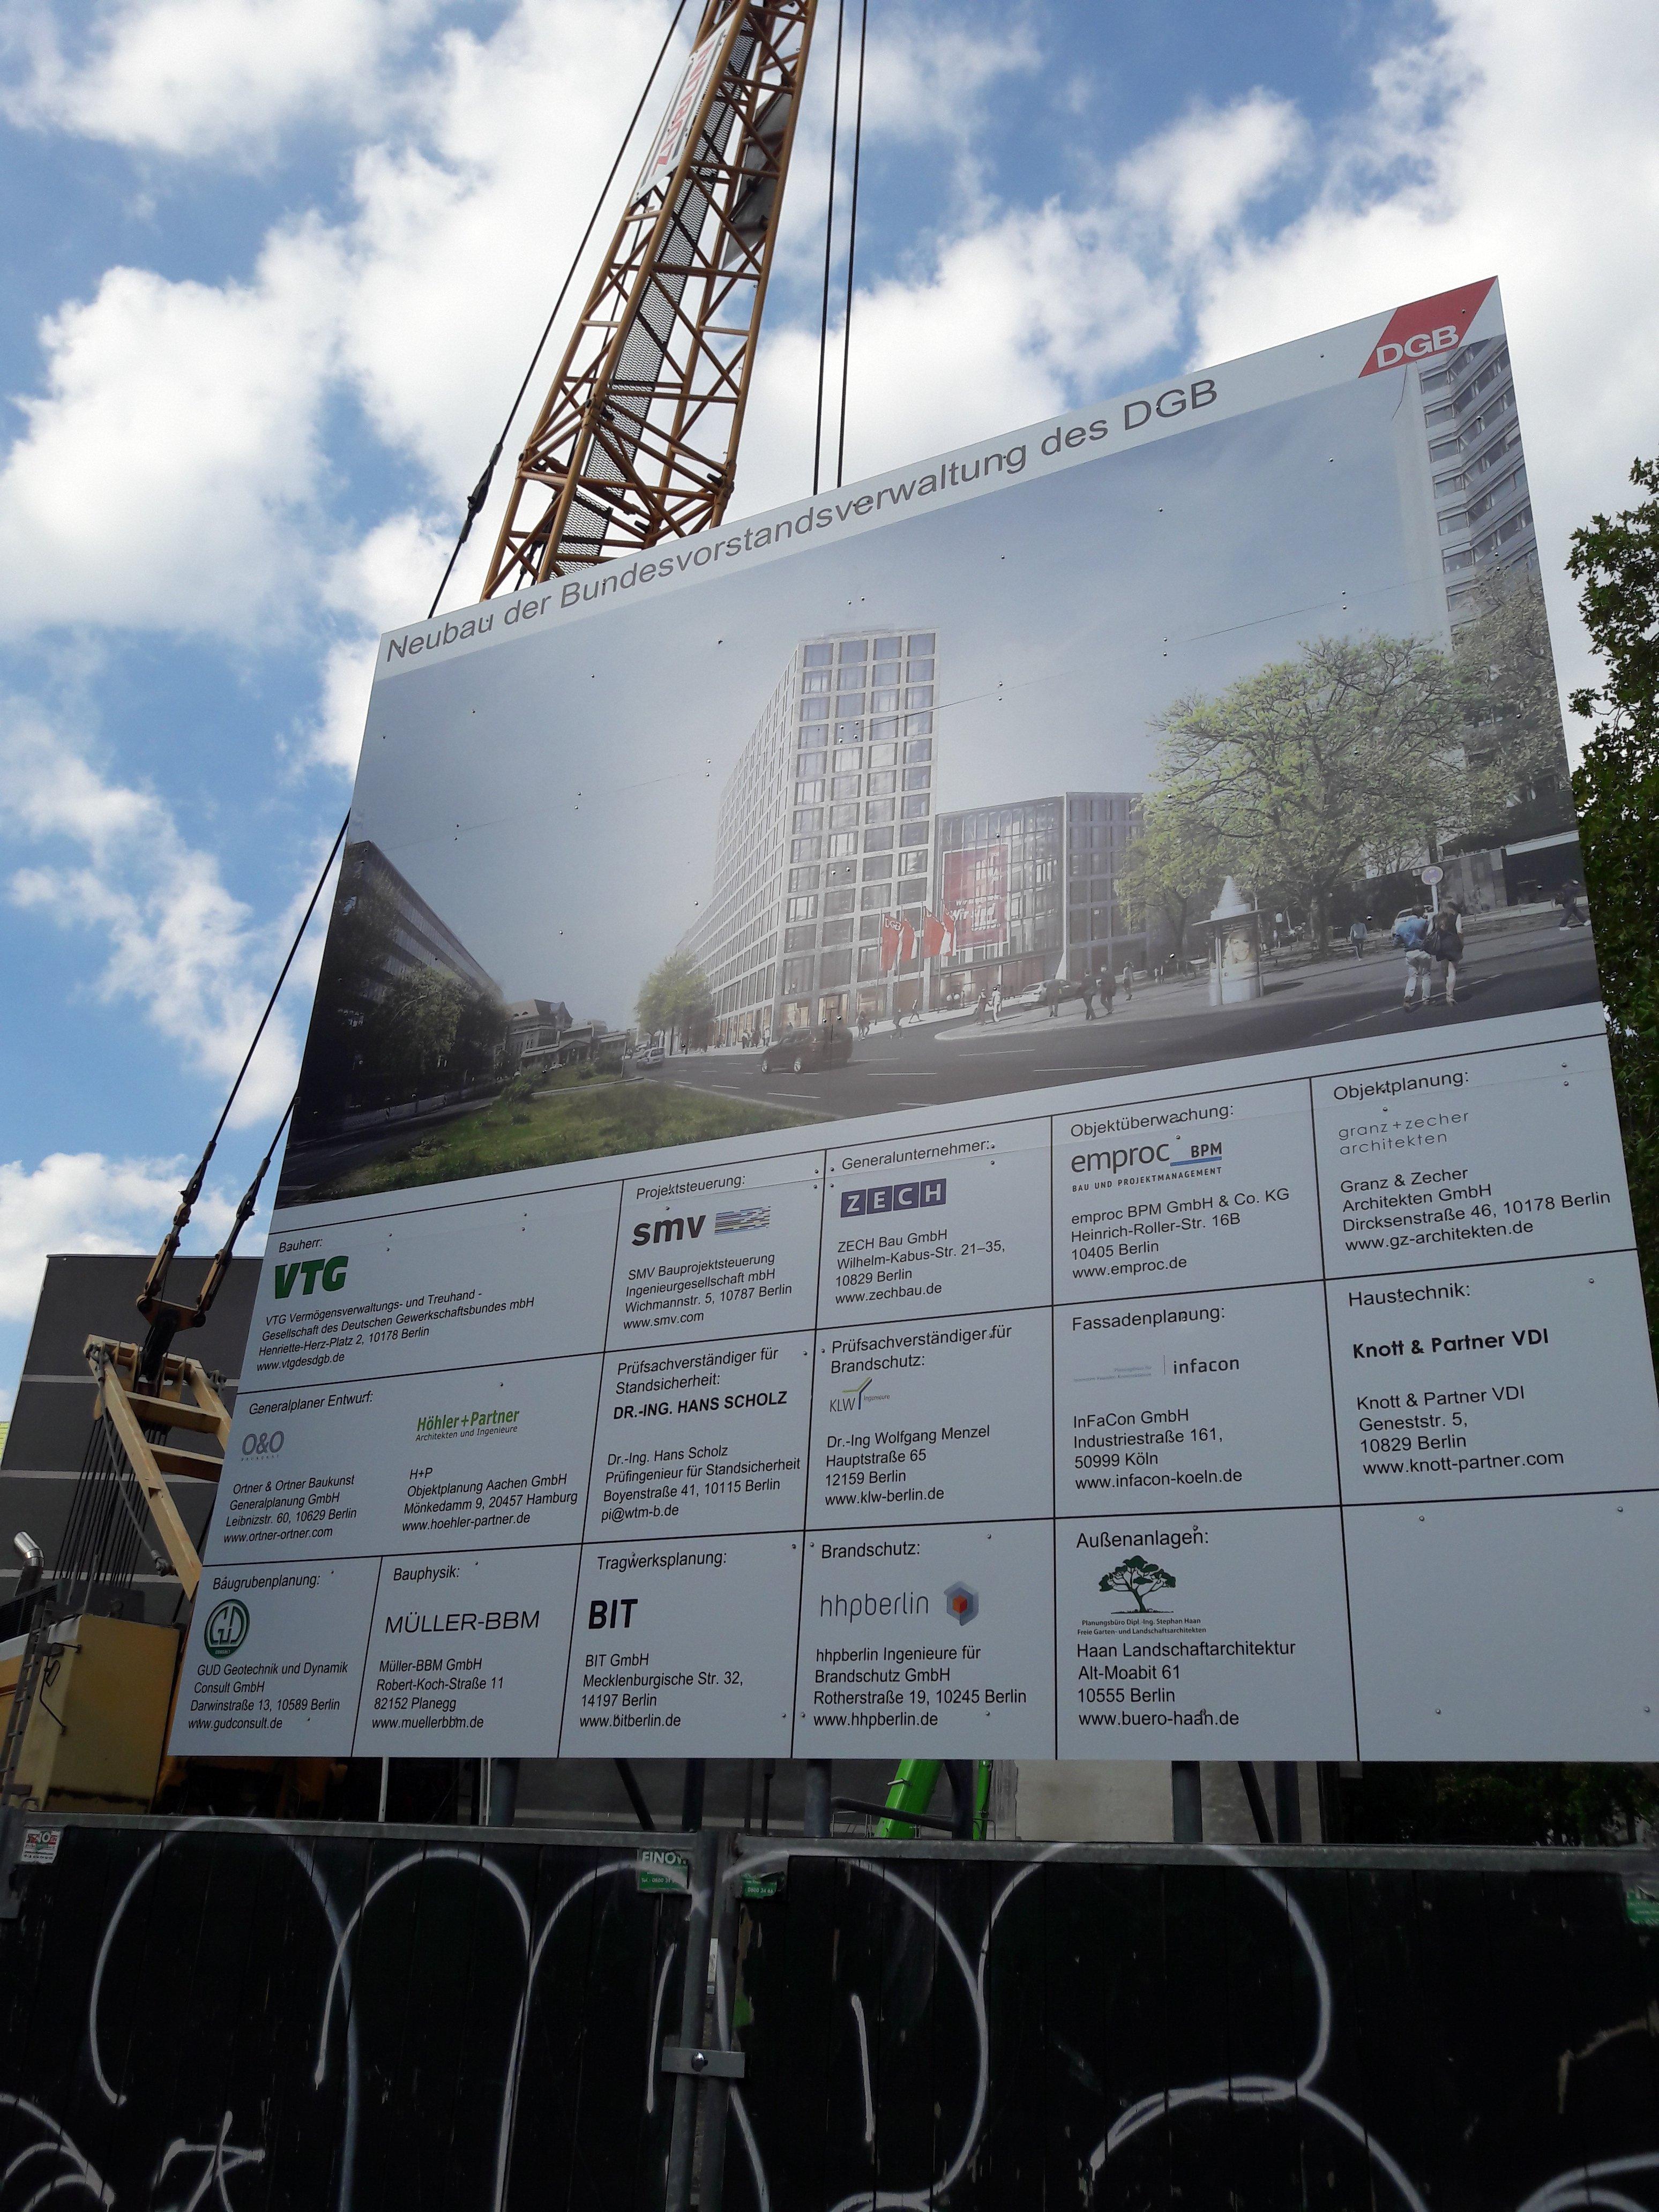 DGB-Neubau-Bauschild.jpg